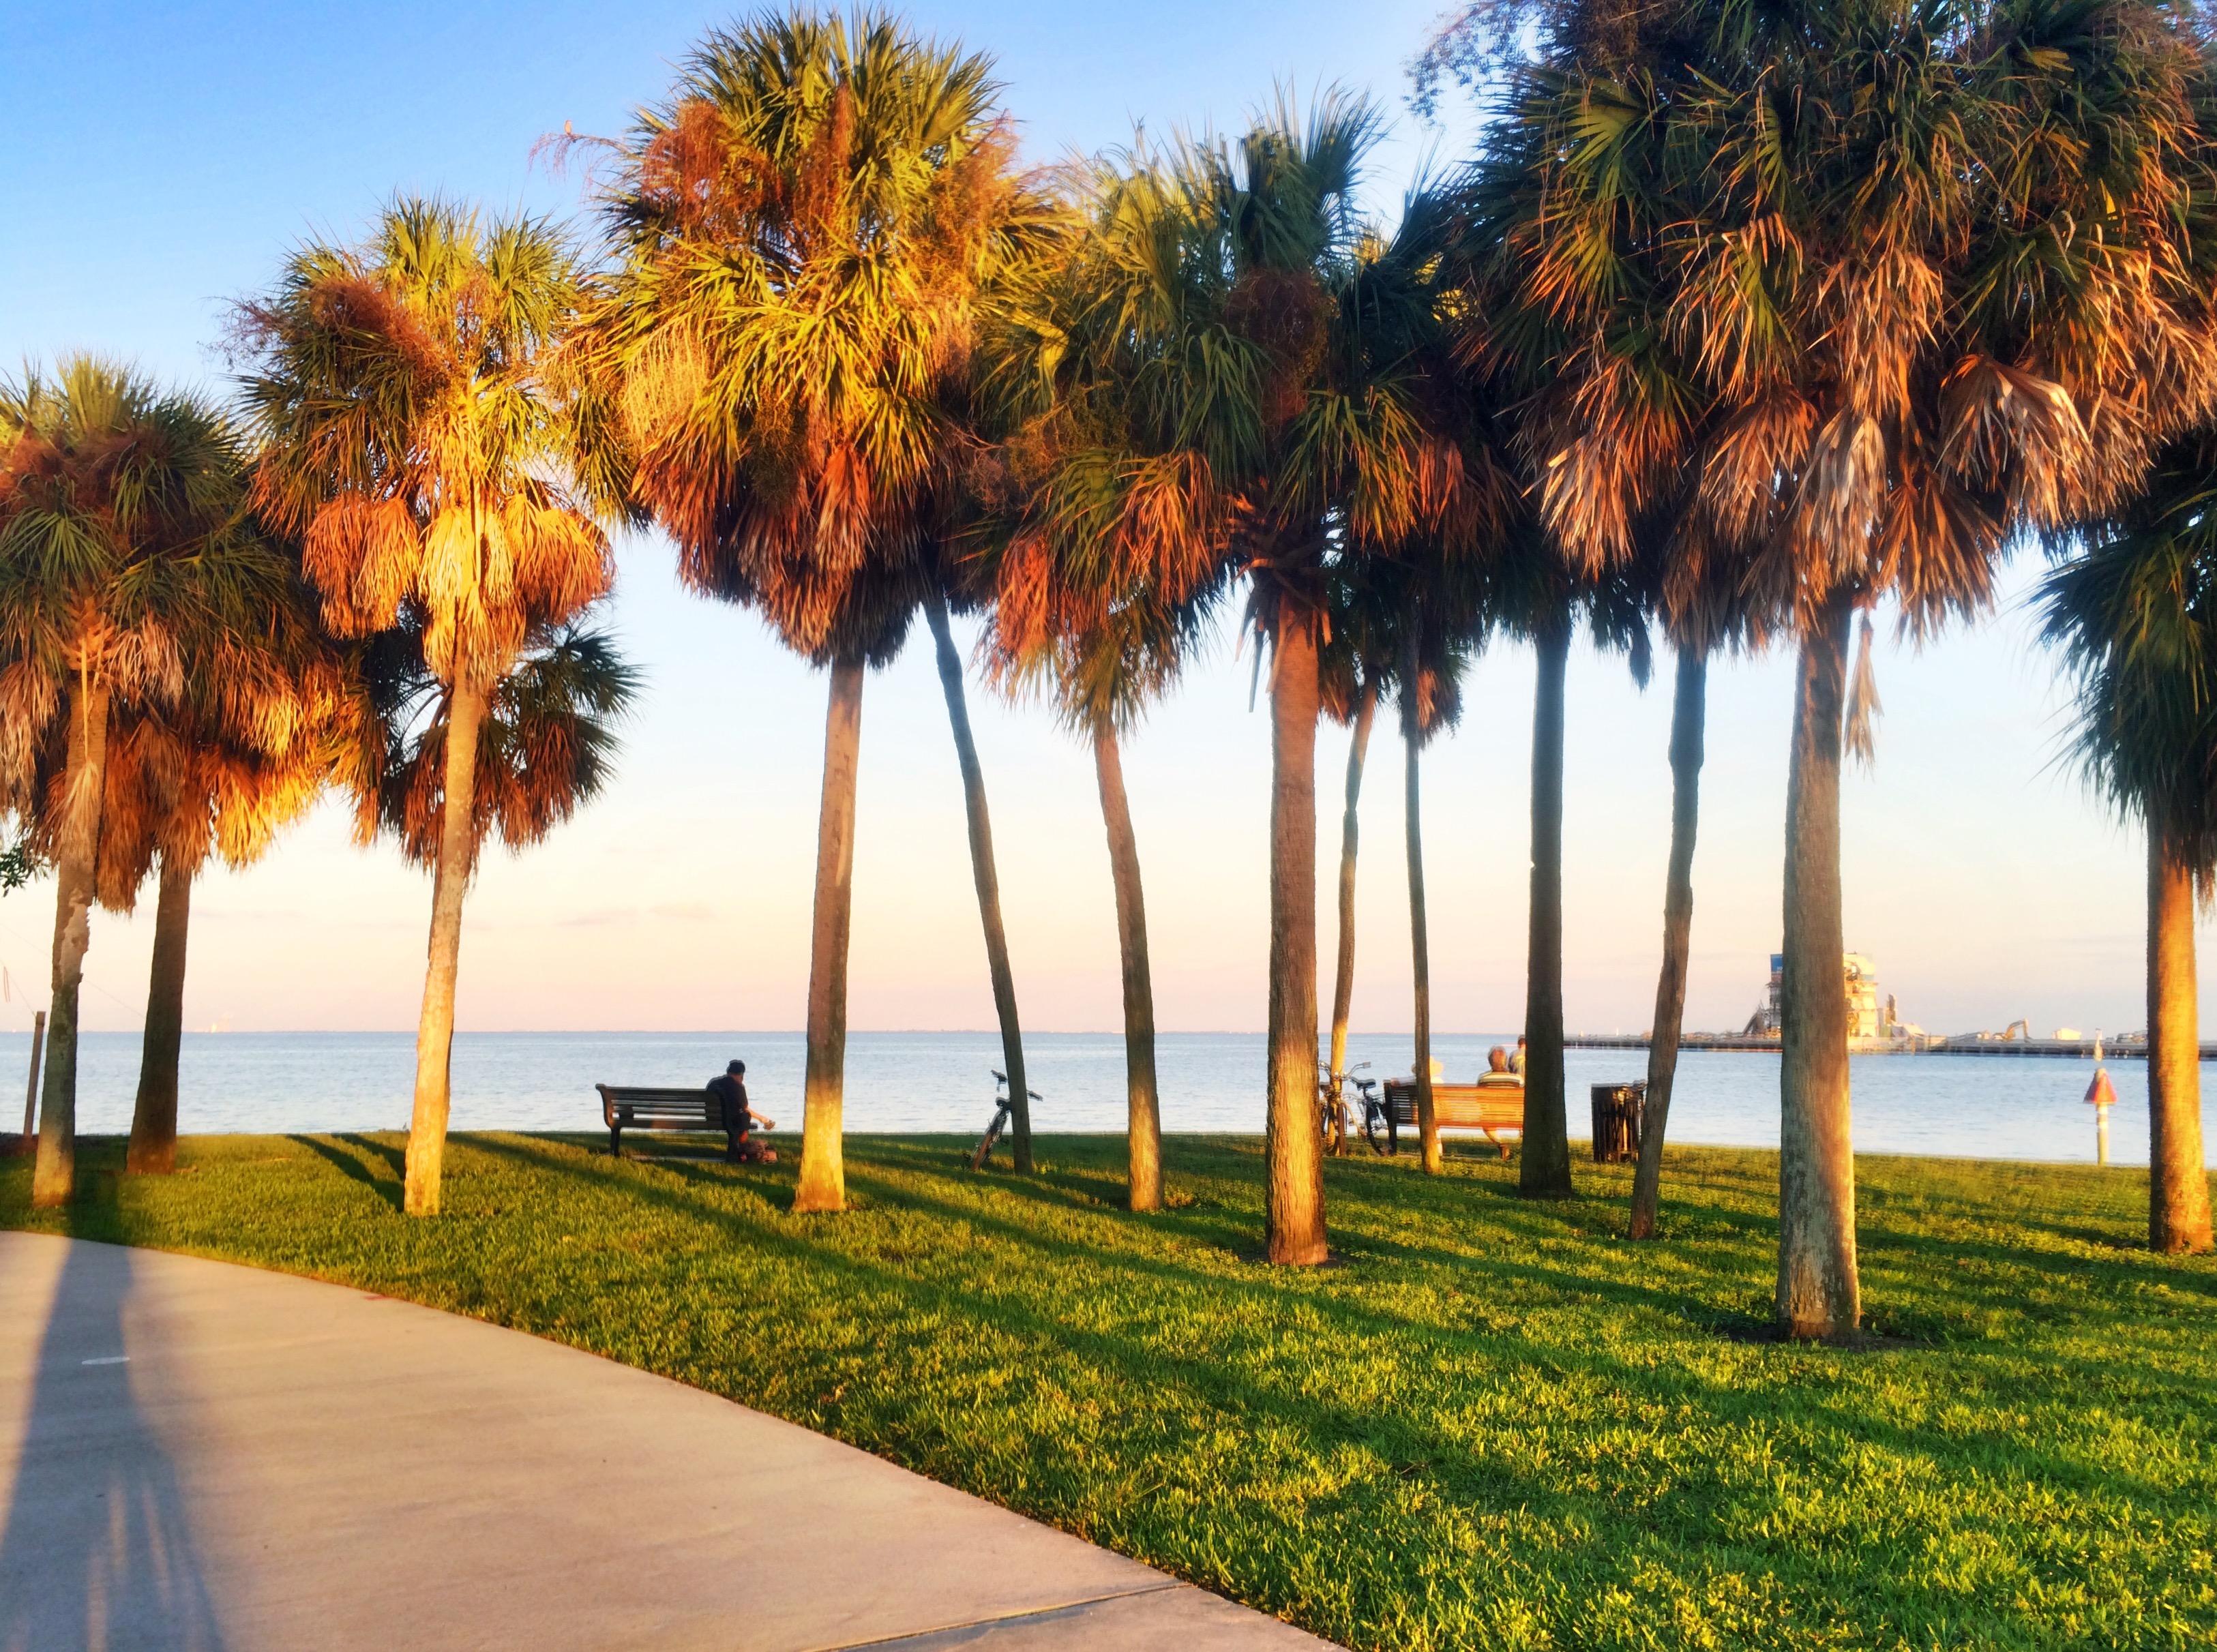 St. Pete, Florida